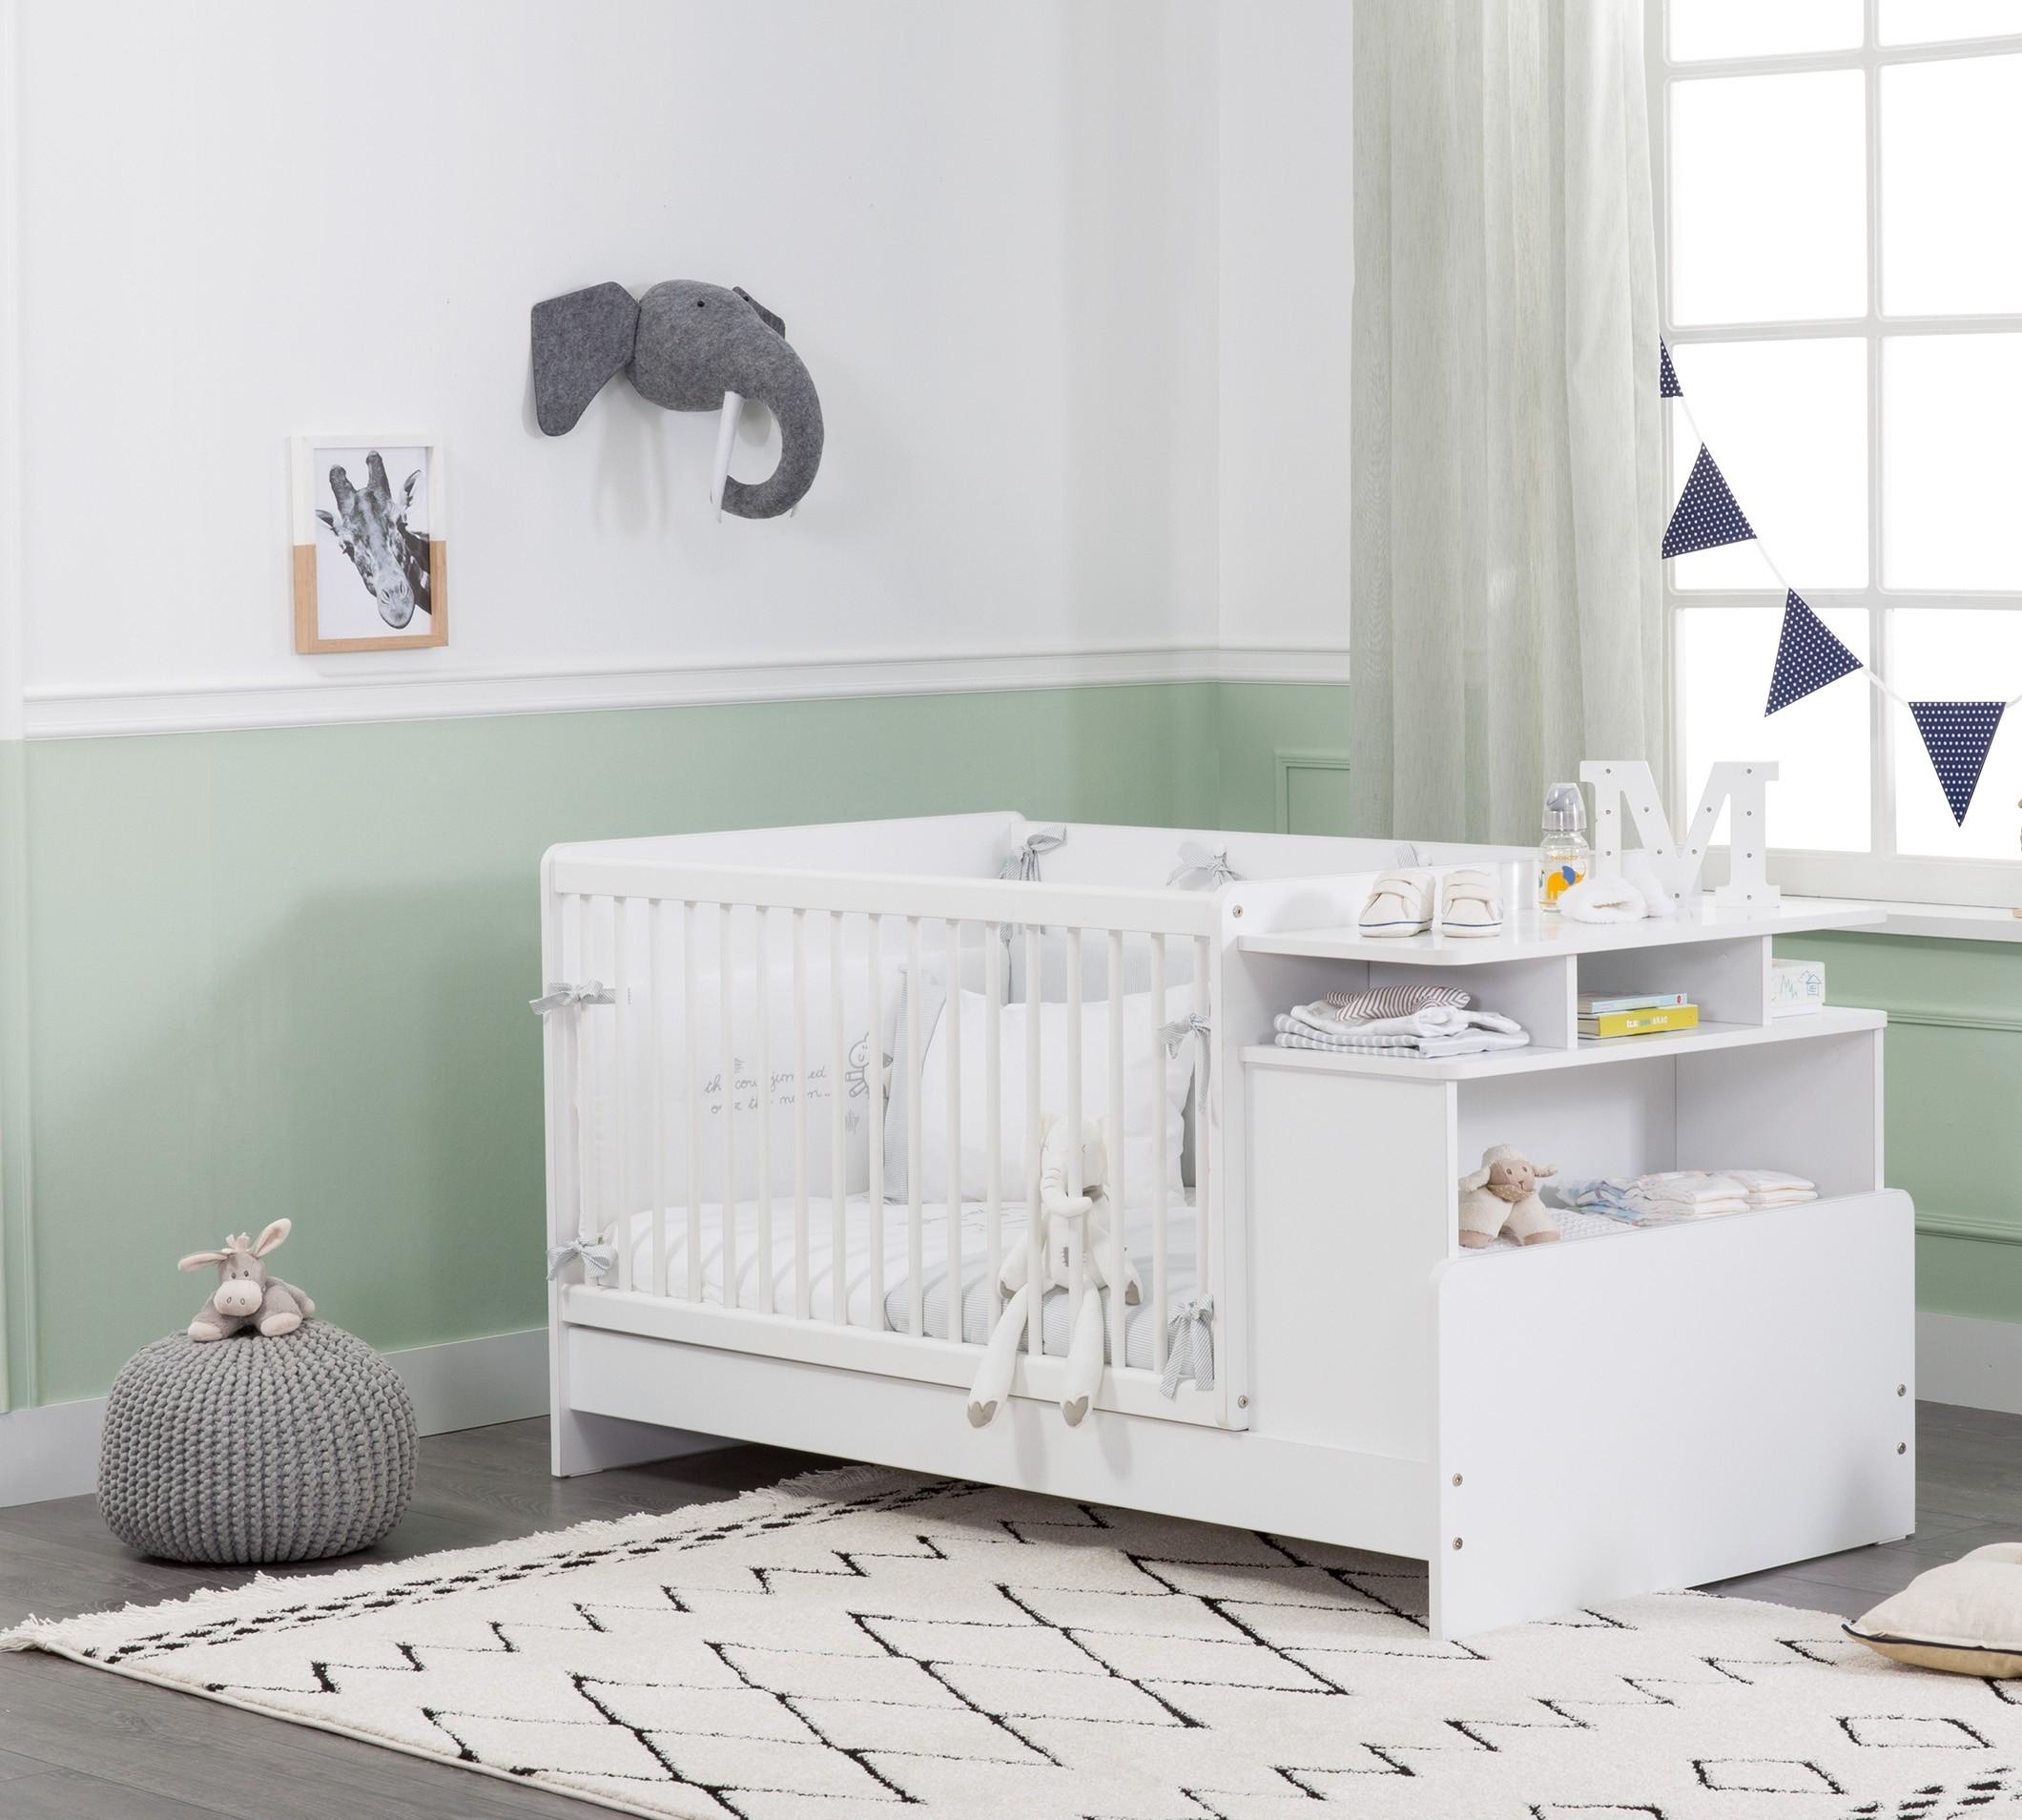 Patut transformabil din pal, pentru bebe Masali Baby Alb, 110 x 70 cm poza